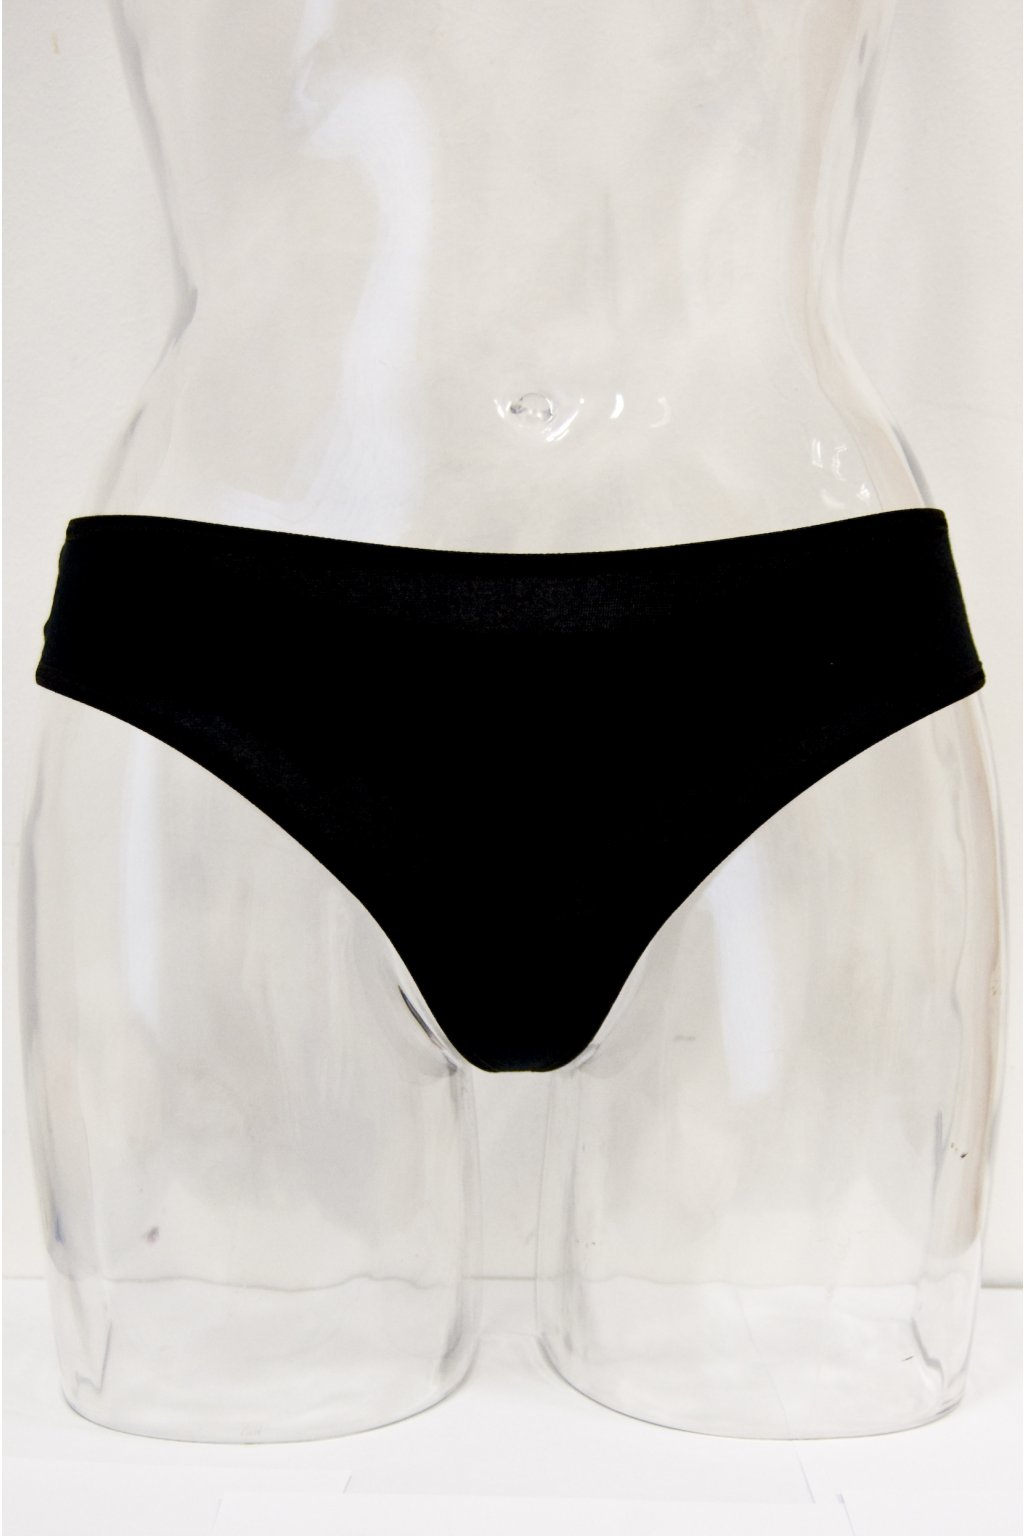 Dámská tanga, 10021 29, černá